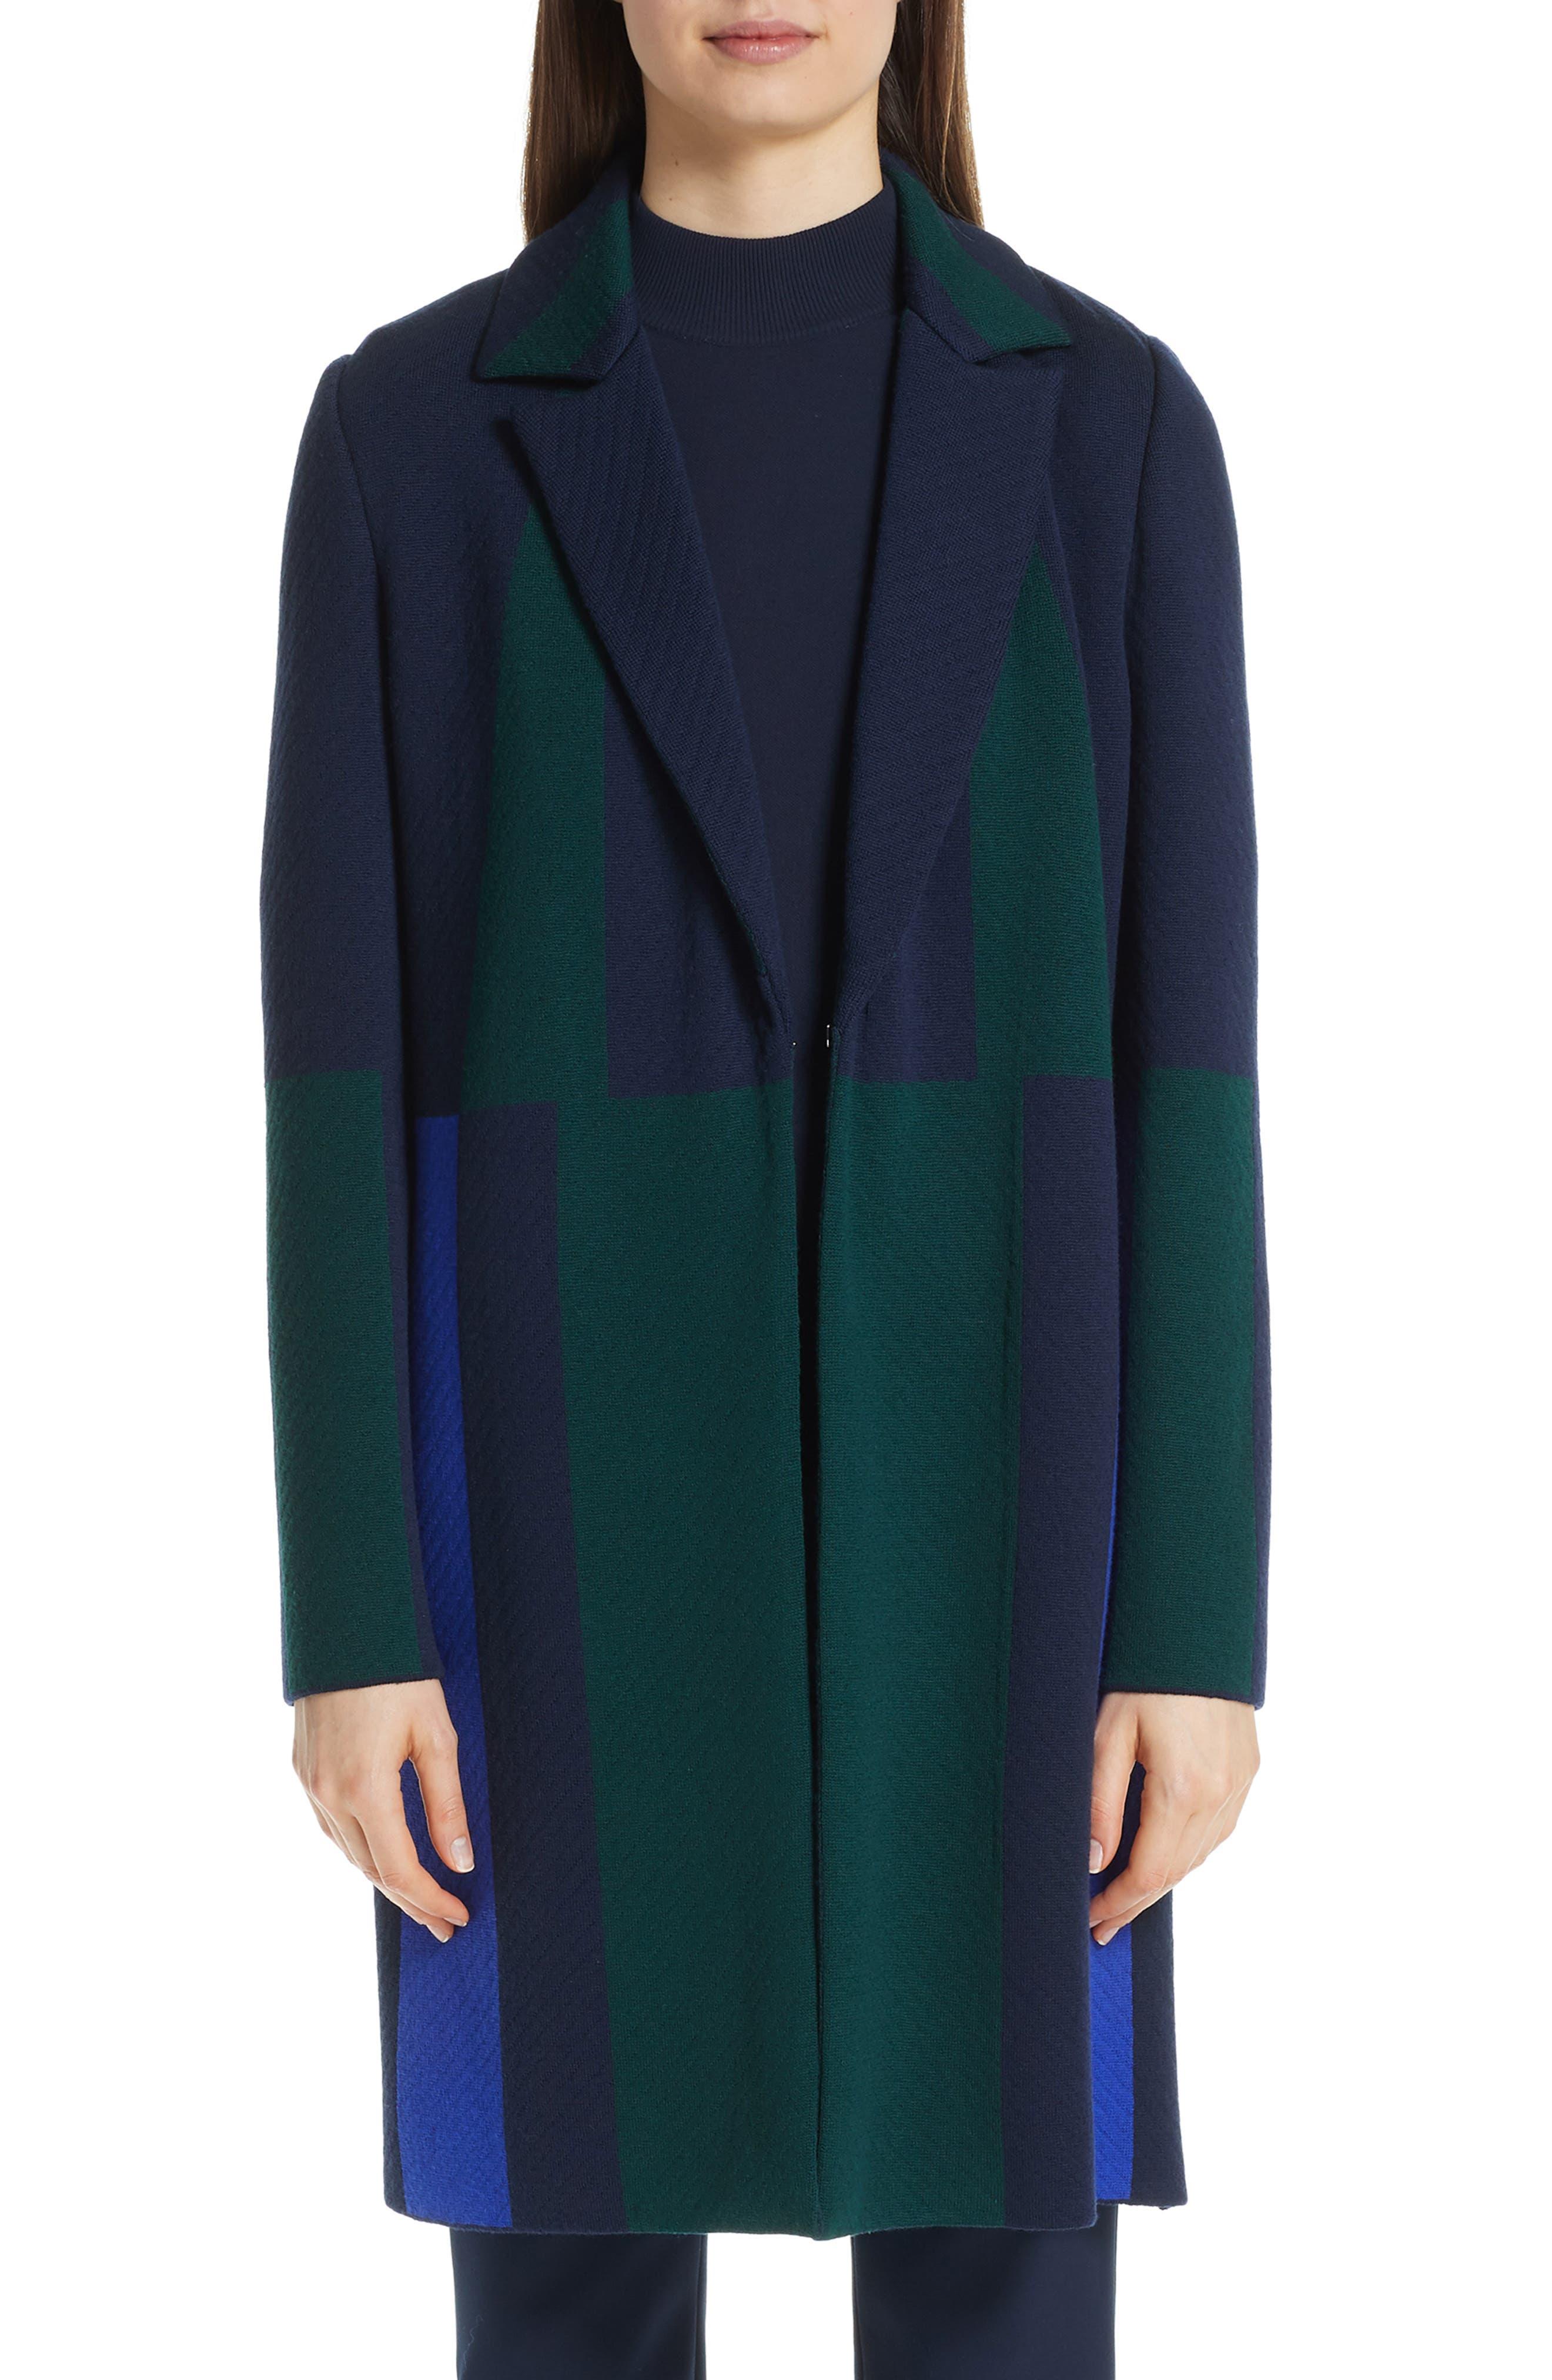 Colorblock Intarsia Wool Twill Jacket,                             Main thumbnail 1, color,                             NAVY MULTI